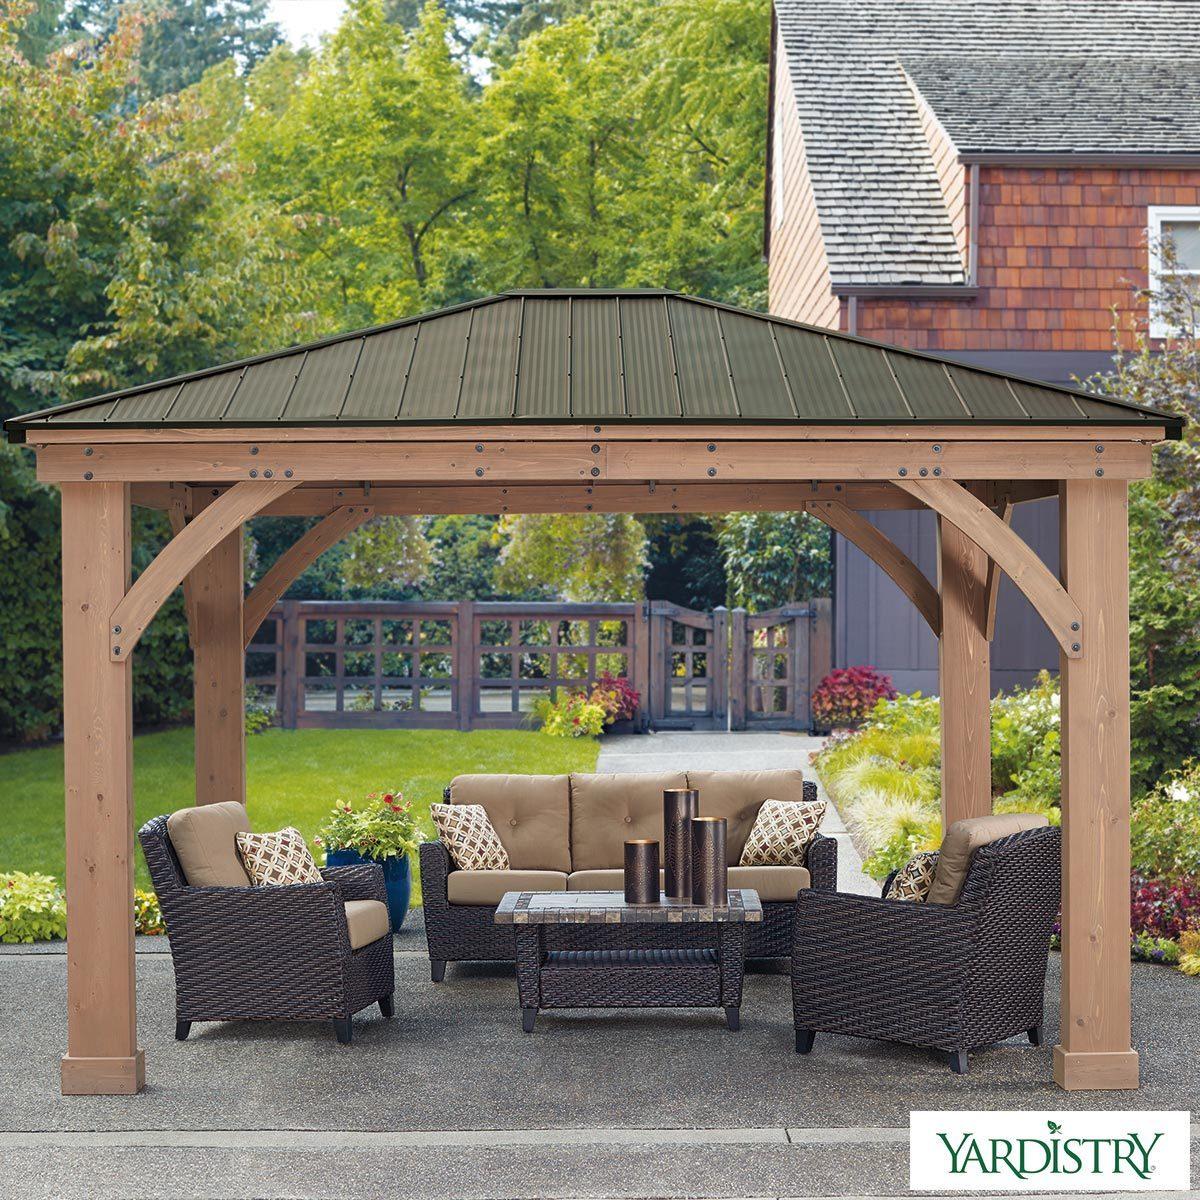 Yardistry 14ft X 12ft 4 3 X 3 7m Cedar Gazebo With Aluminium Roof Costco Uk